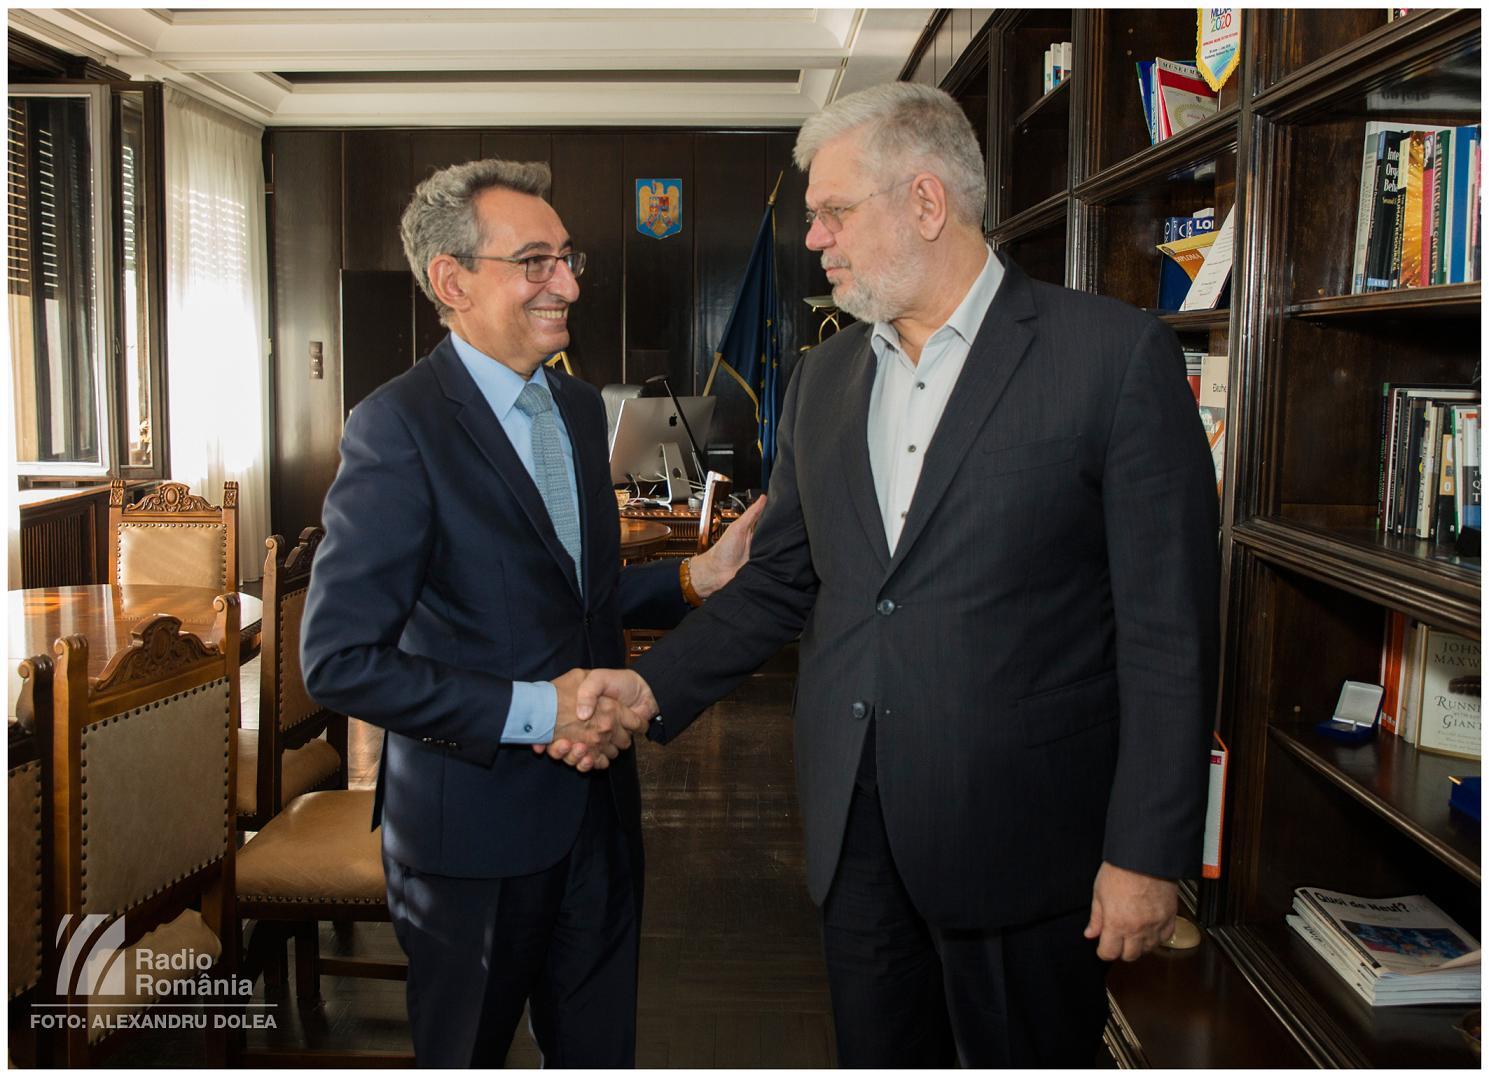 ambassador-of-uruguay-to-bucharest-visits-radio-romania